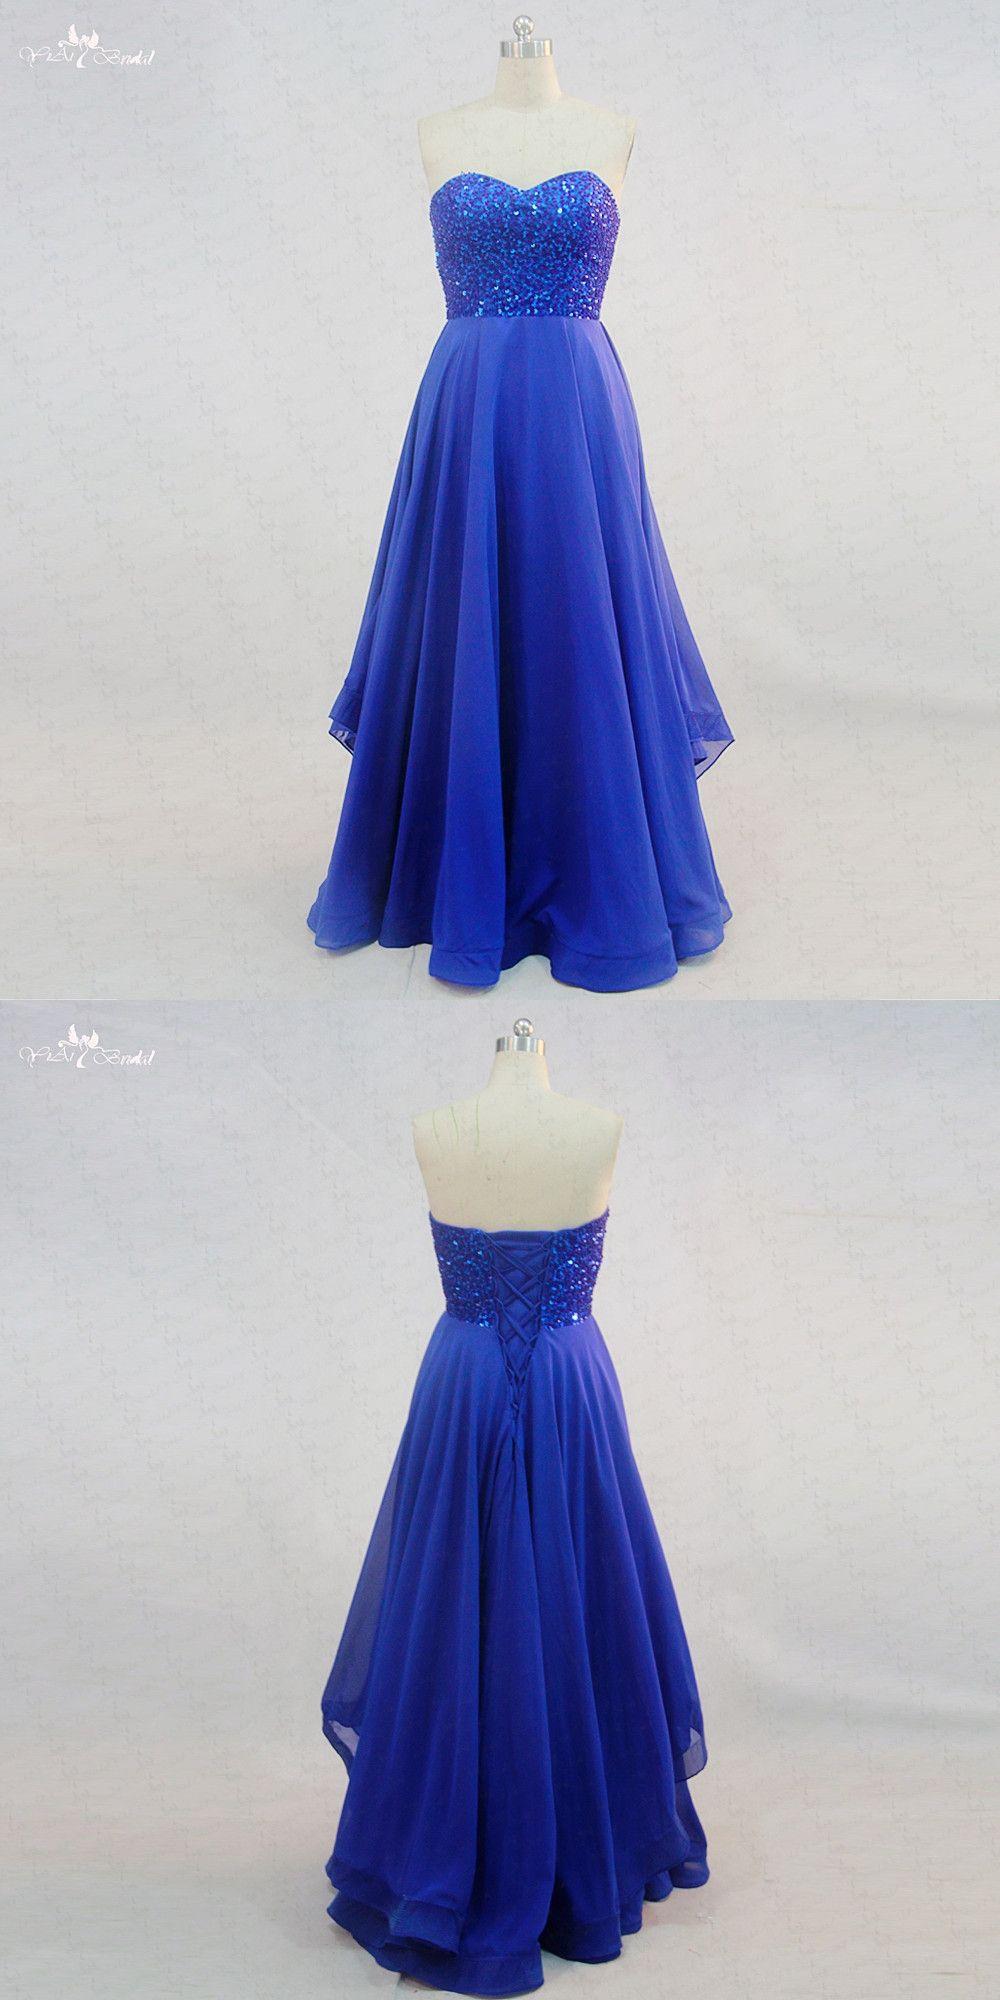 RSE722 Long Beaded Royal Blue Prom Dresses Gradient Dress Graduation Dress  Vestido De Formatura Longo 3f80b5dc8c63